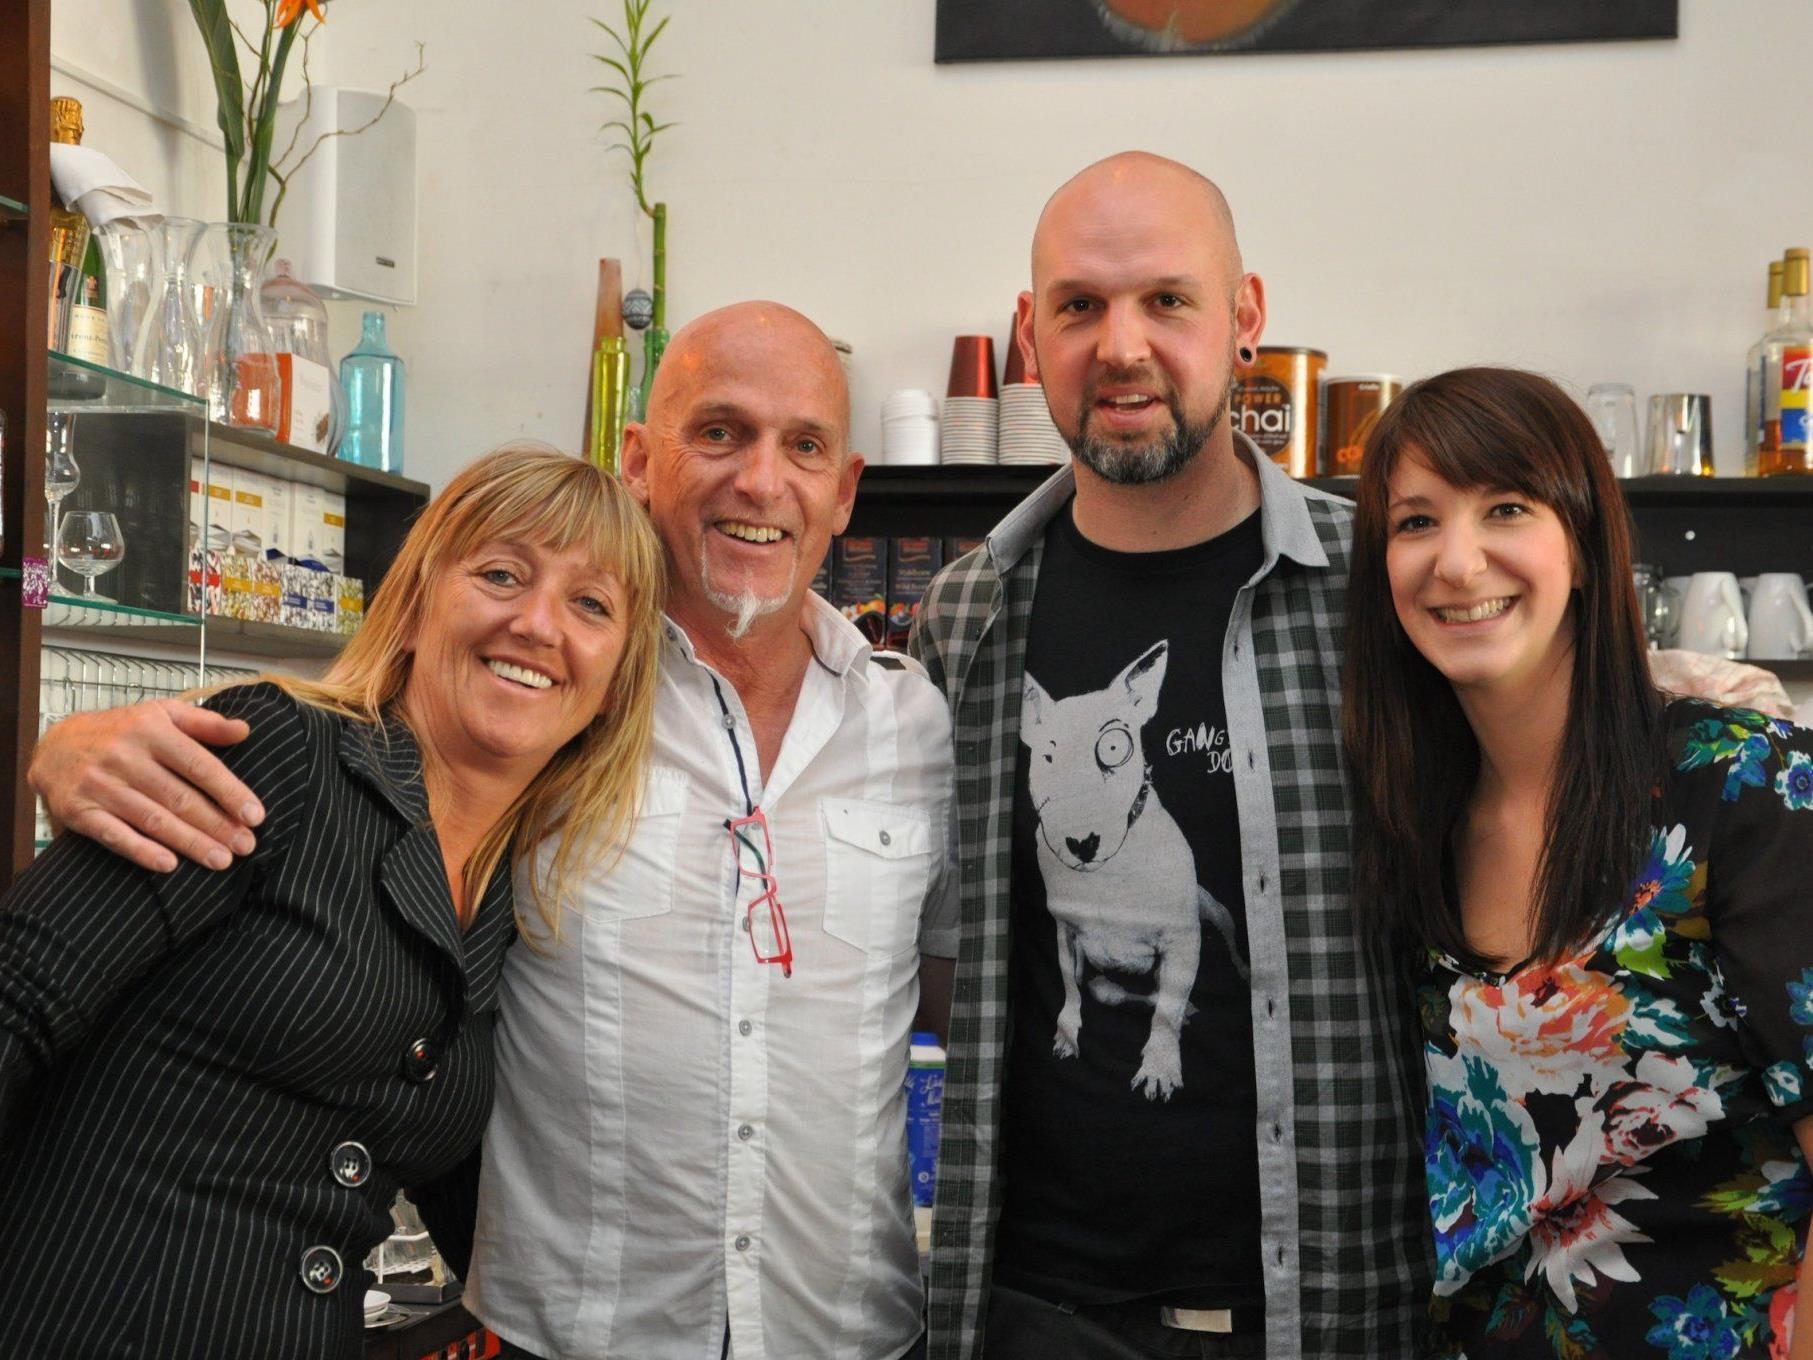 (v.l.) Brigitte, German, Stephen und Kathi